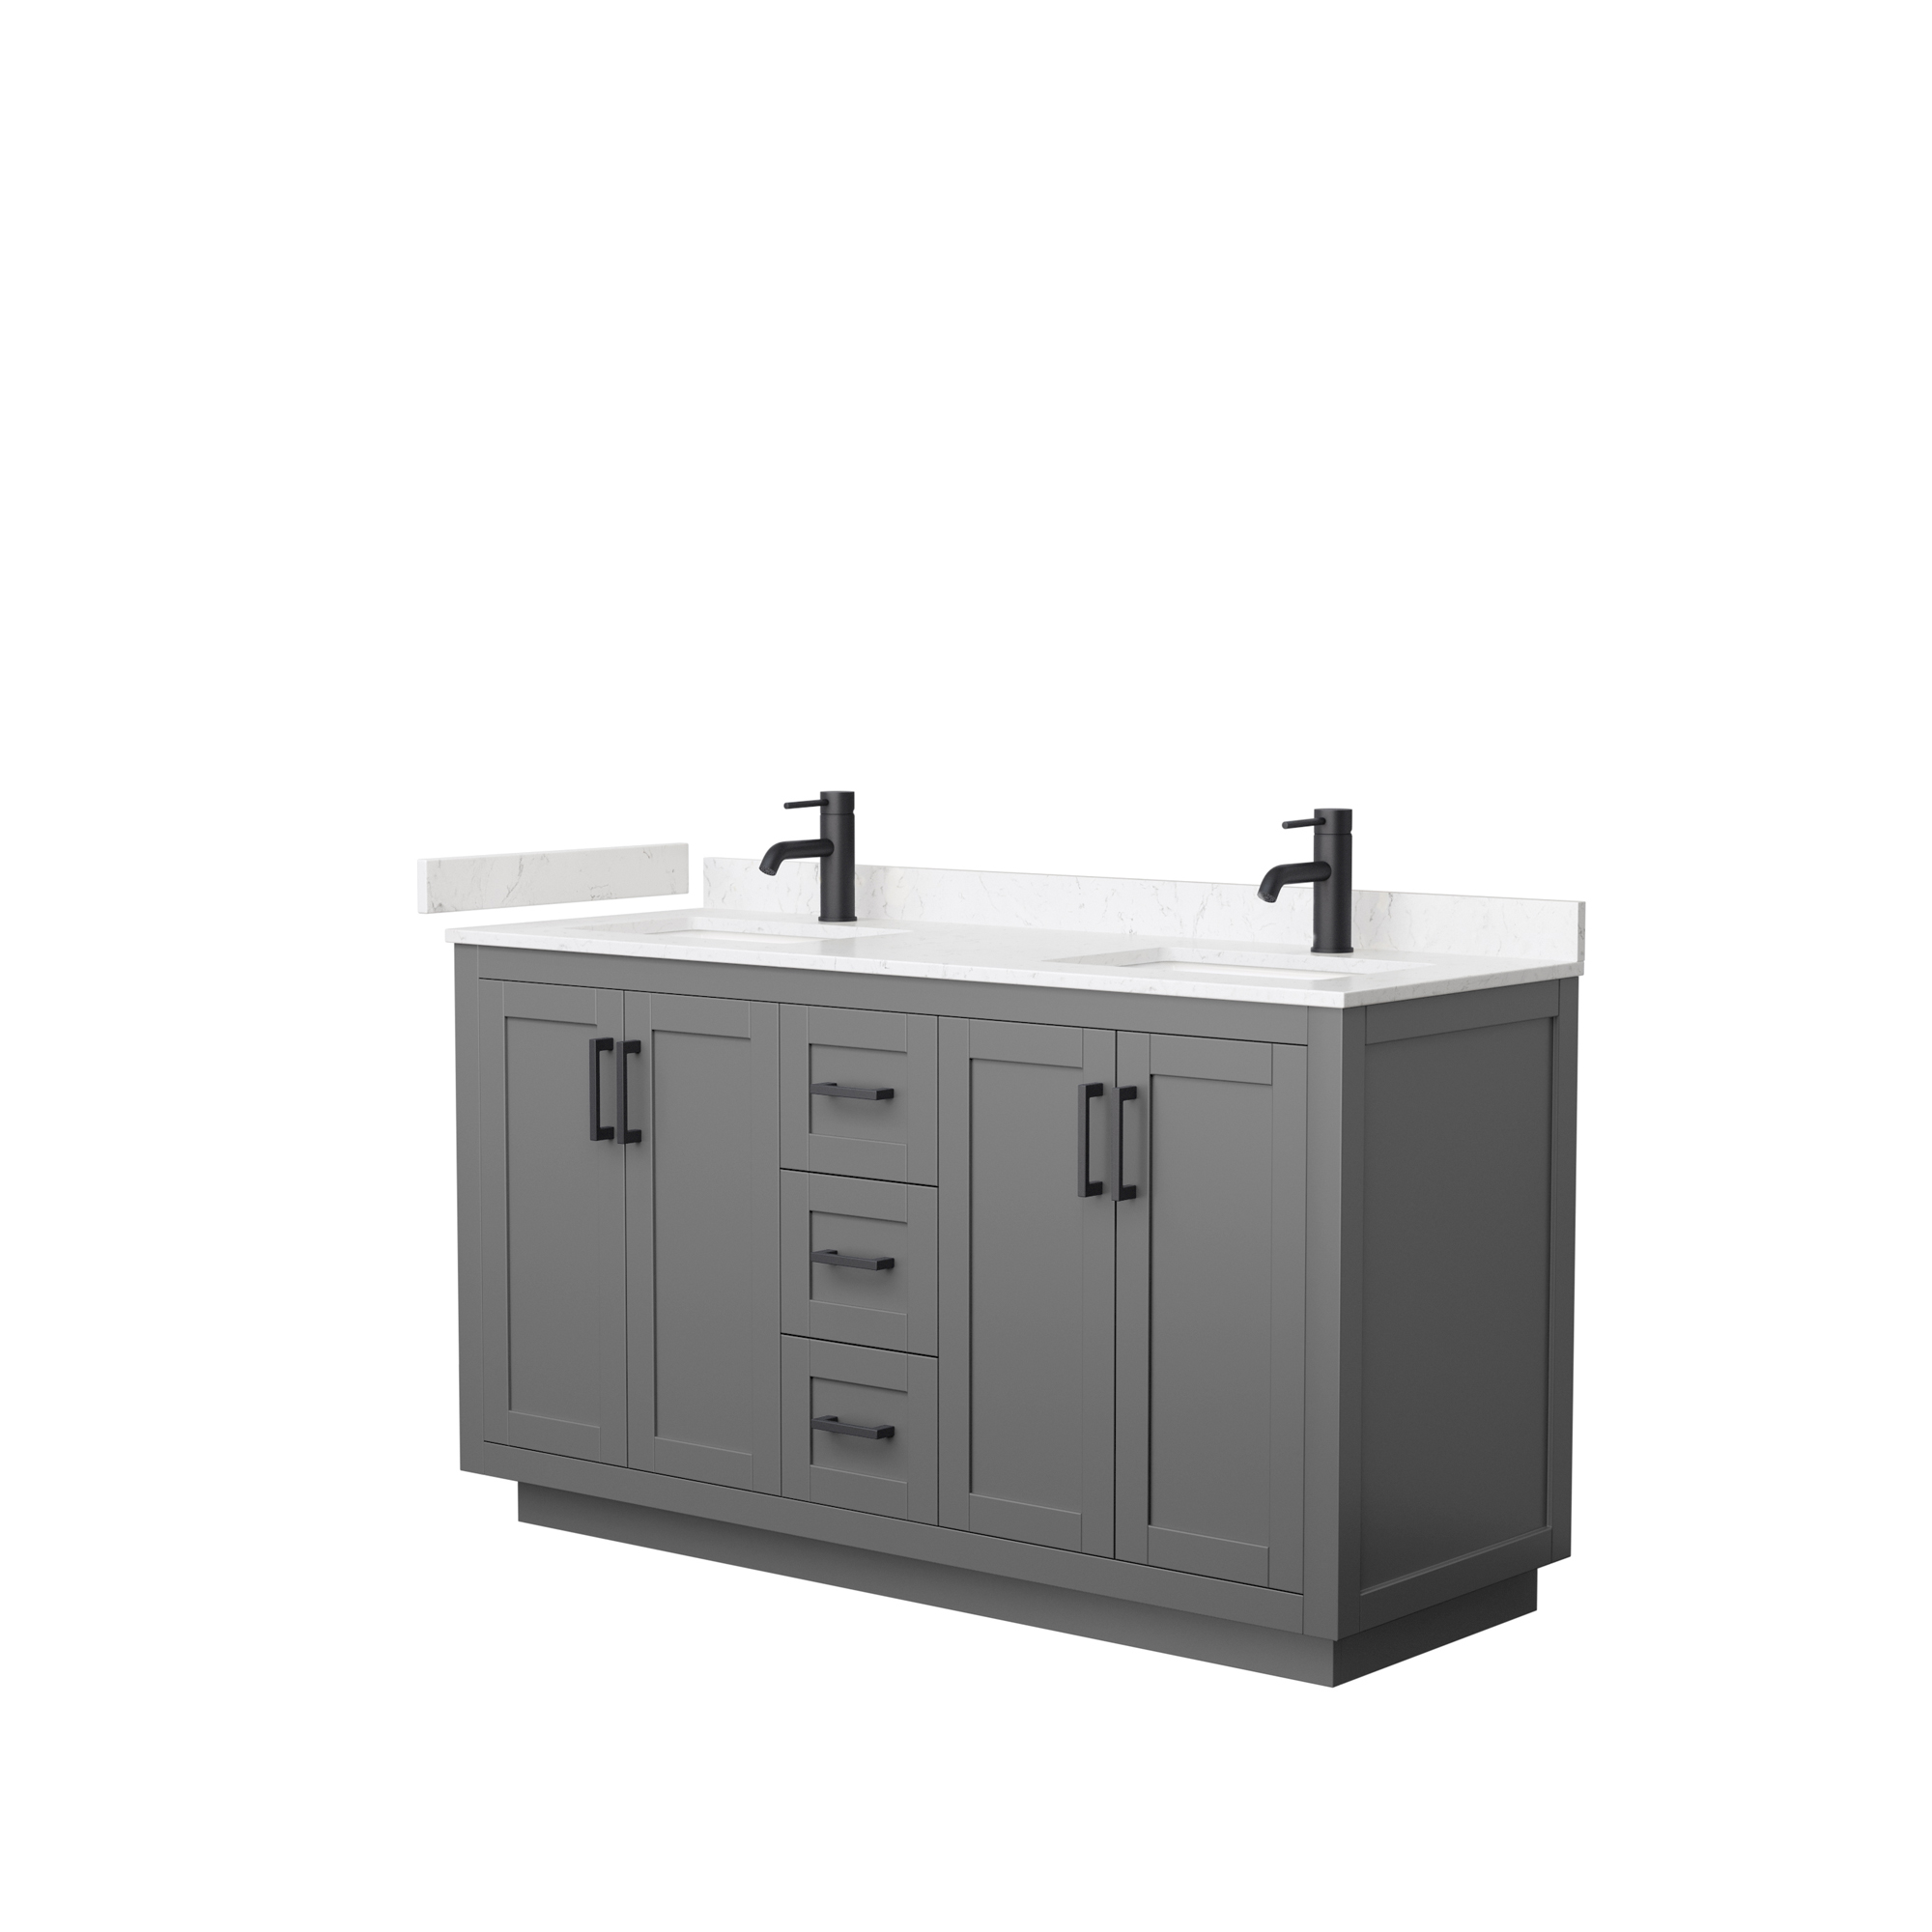 "60"" Double Bathroom Vanity in Dark Gray, Light-Vein Carrara Cultured Marble Countertop, Undermount Square Sinks, Matte Black Trim"